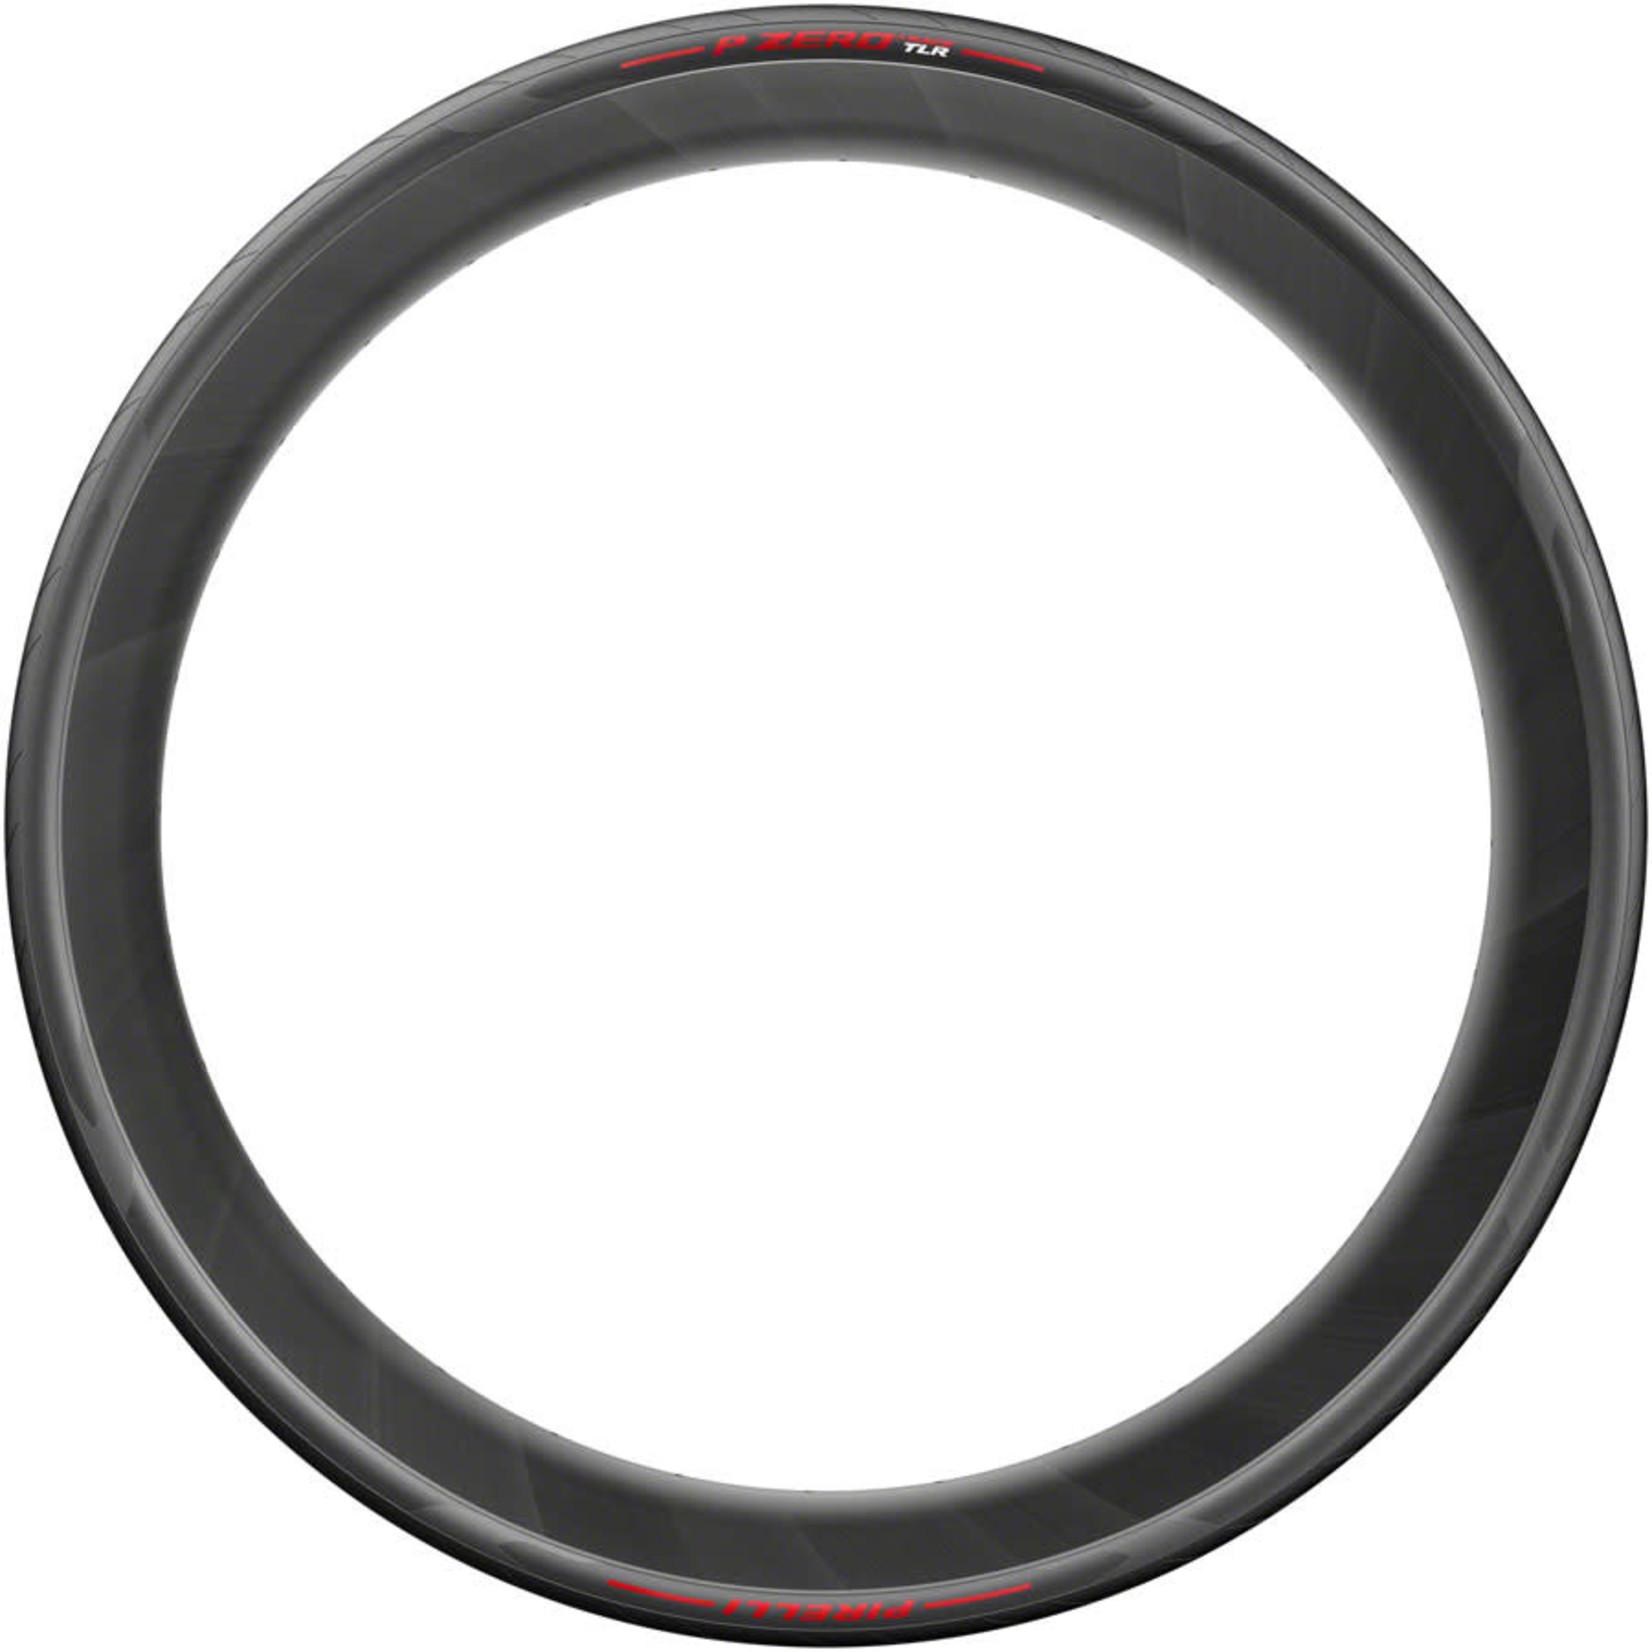 Pirelli Tire LLC Pirelli P ZERO Race TLR Tire - 700 x 26, Tubeless, Folding, Red Label